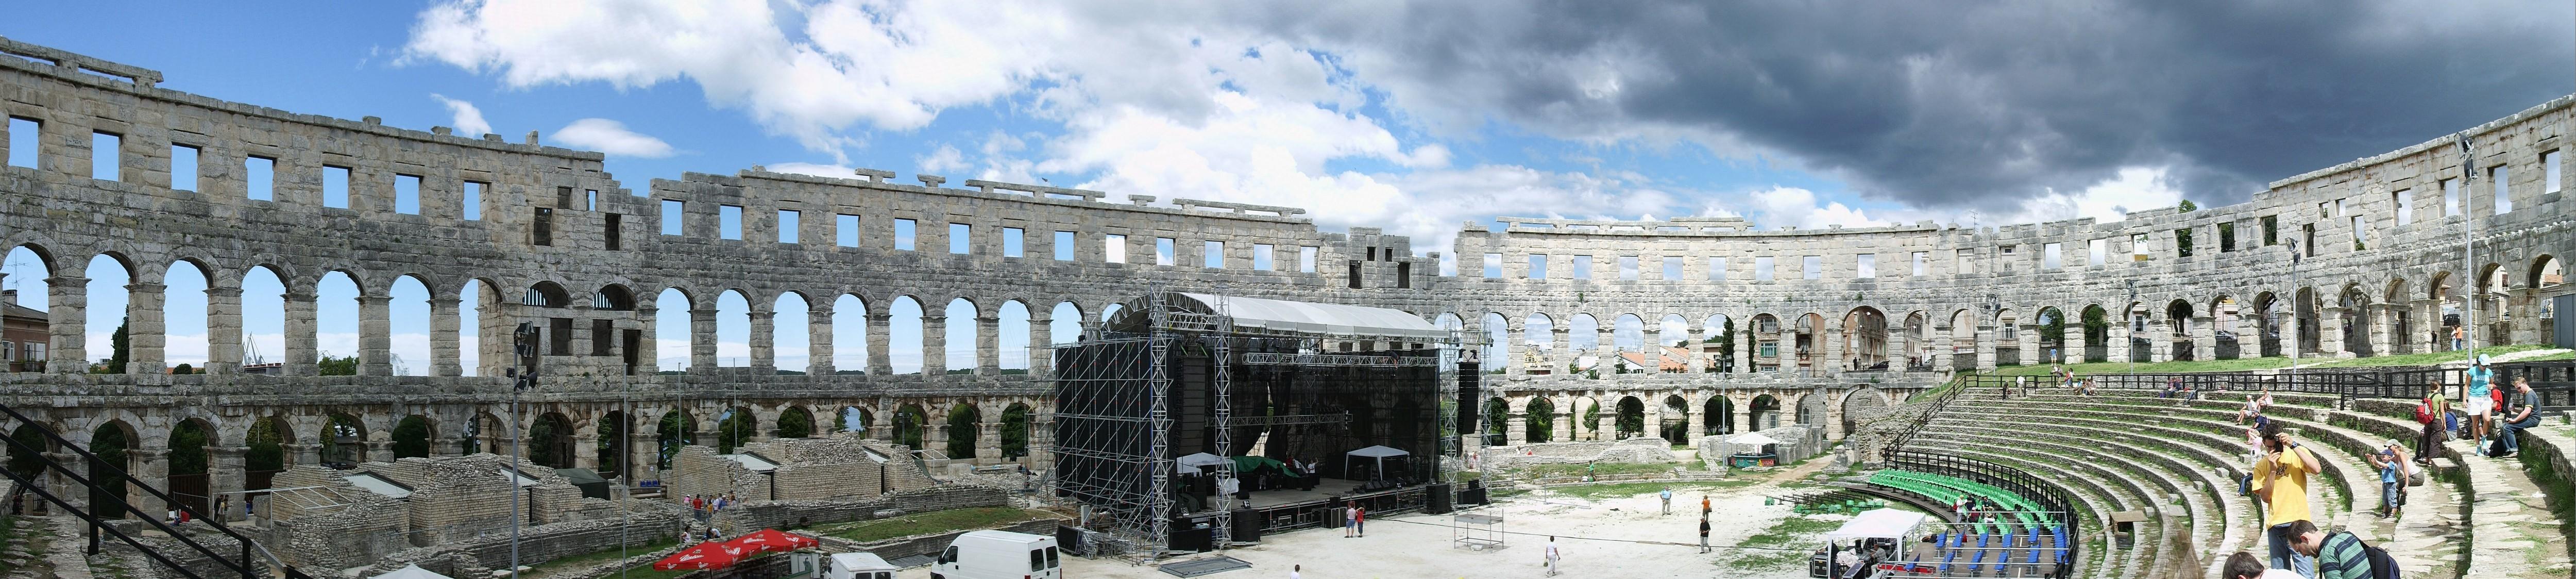 Pula Croatia Amphitheater File:amphitheater Pula Innen